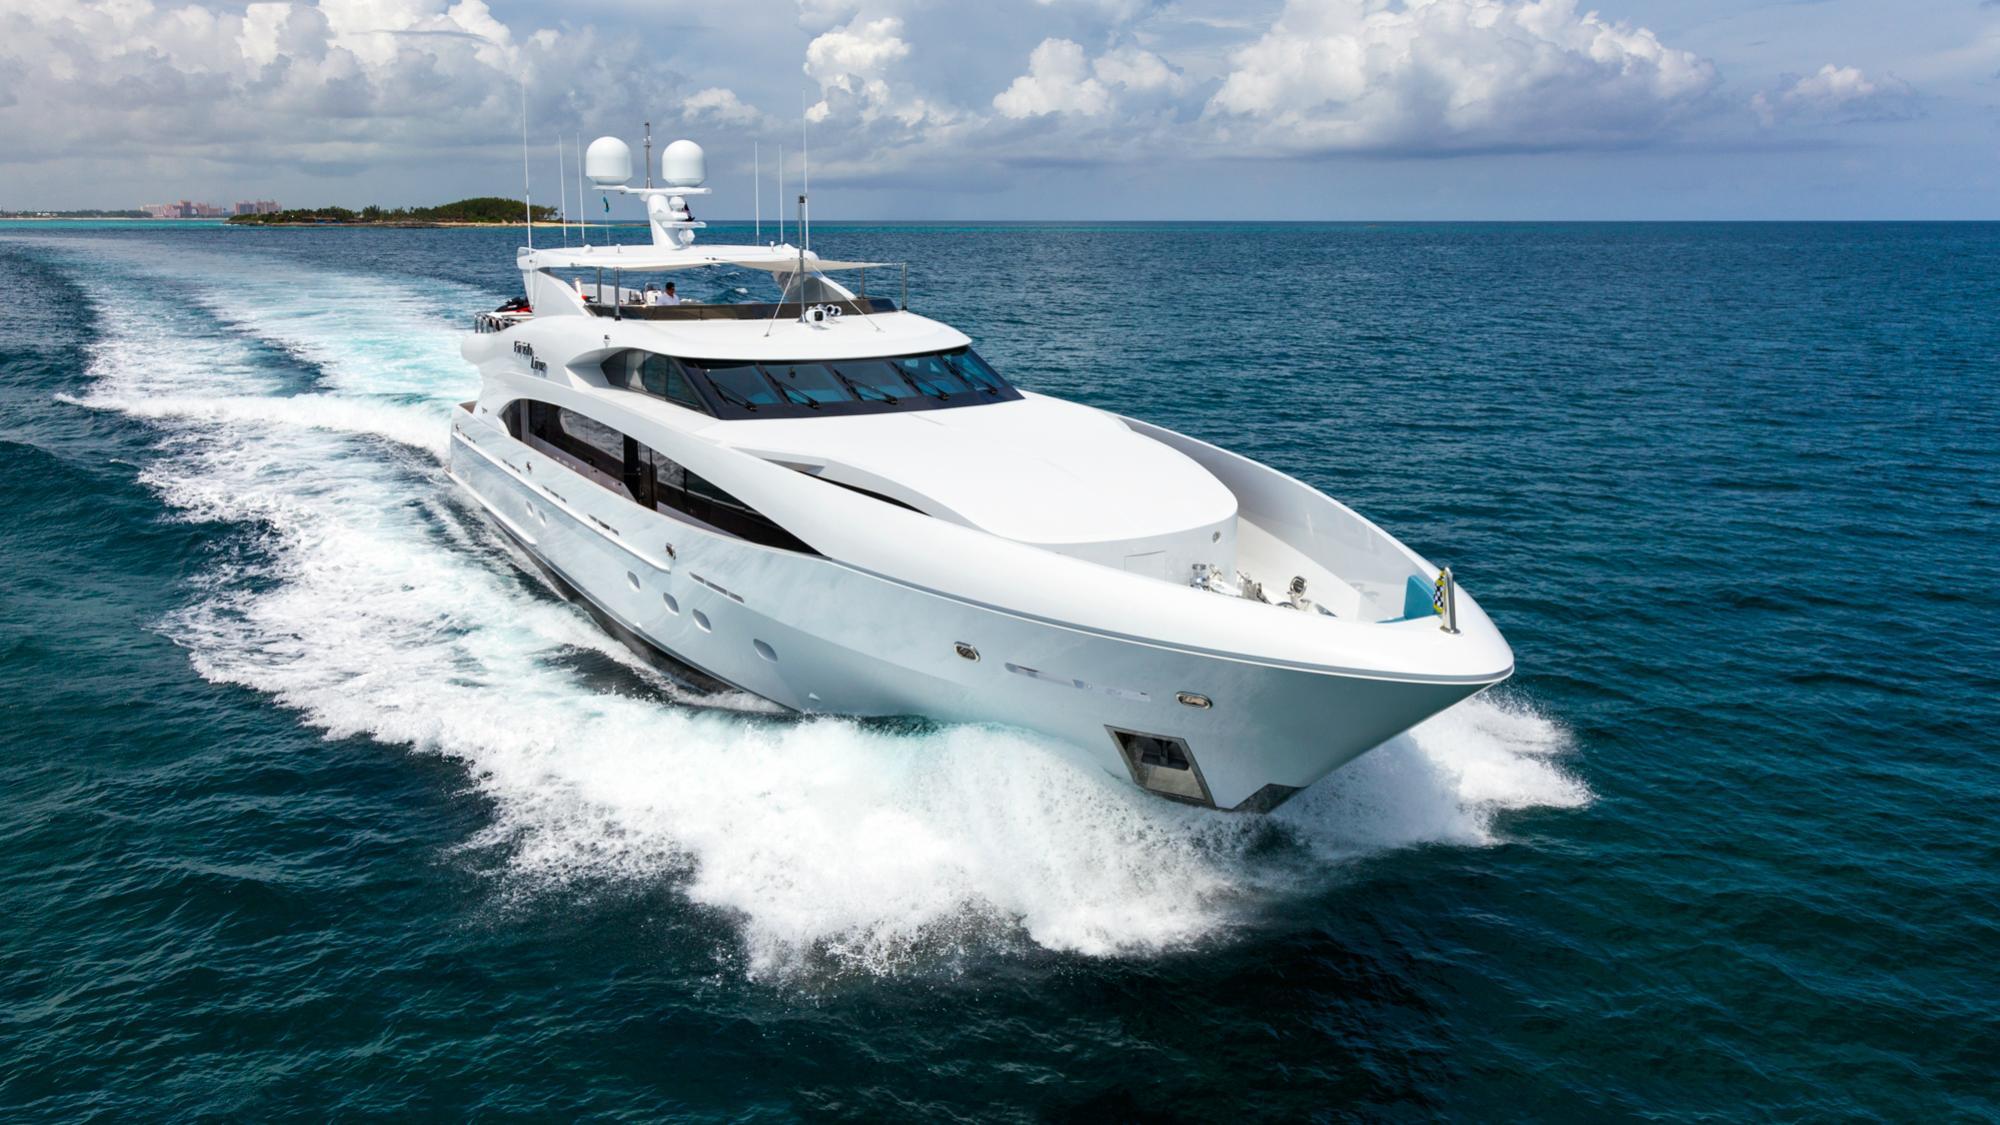 finish-line-motor-yacht-trinity-2013-37m-cruising-half-profile